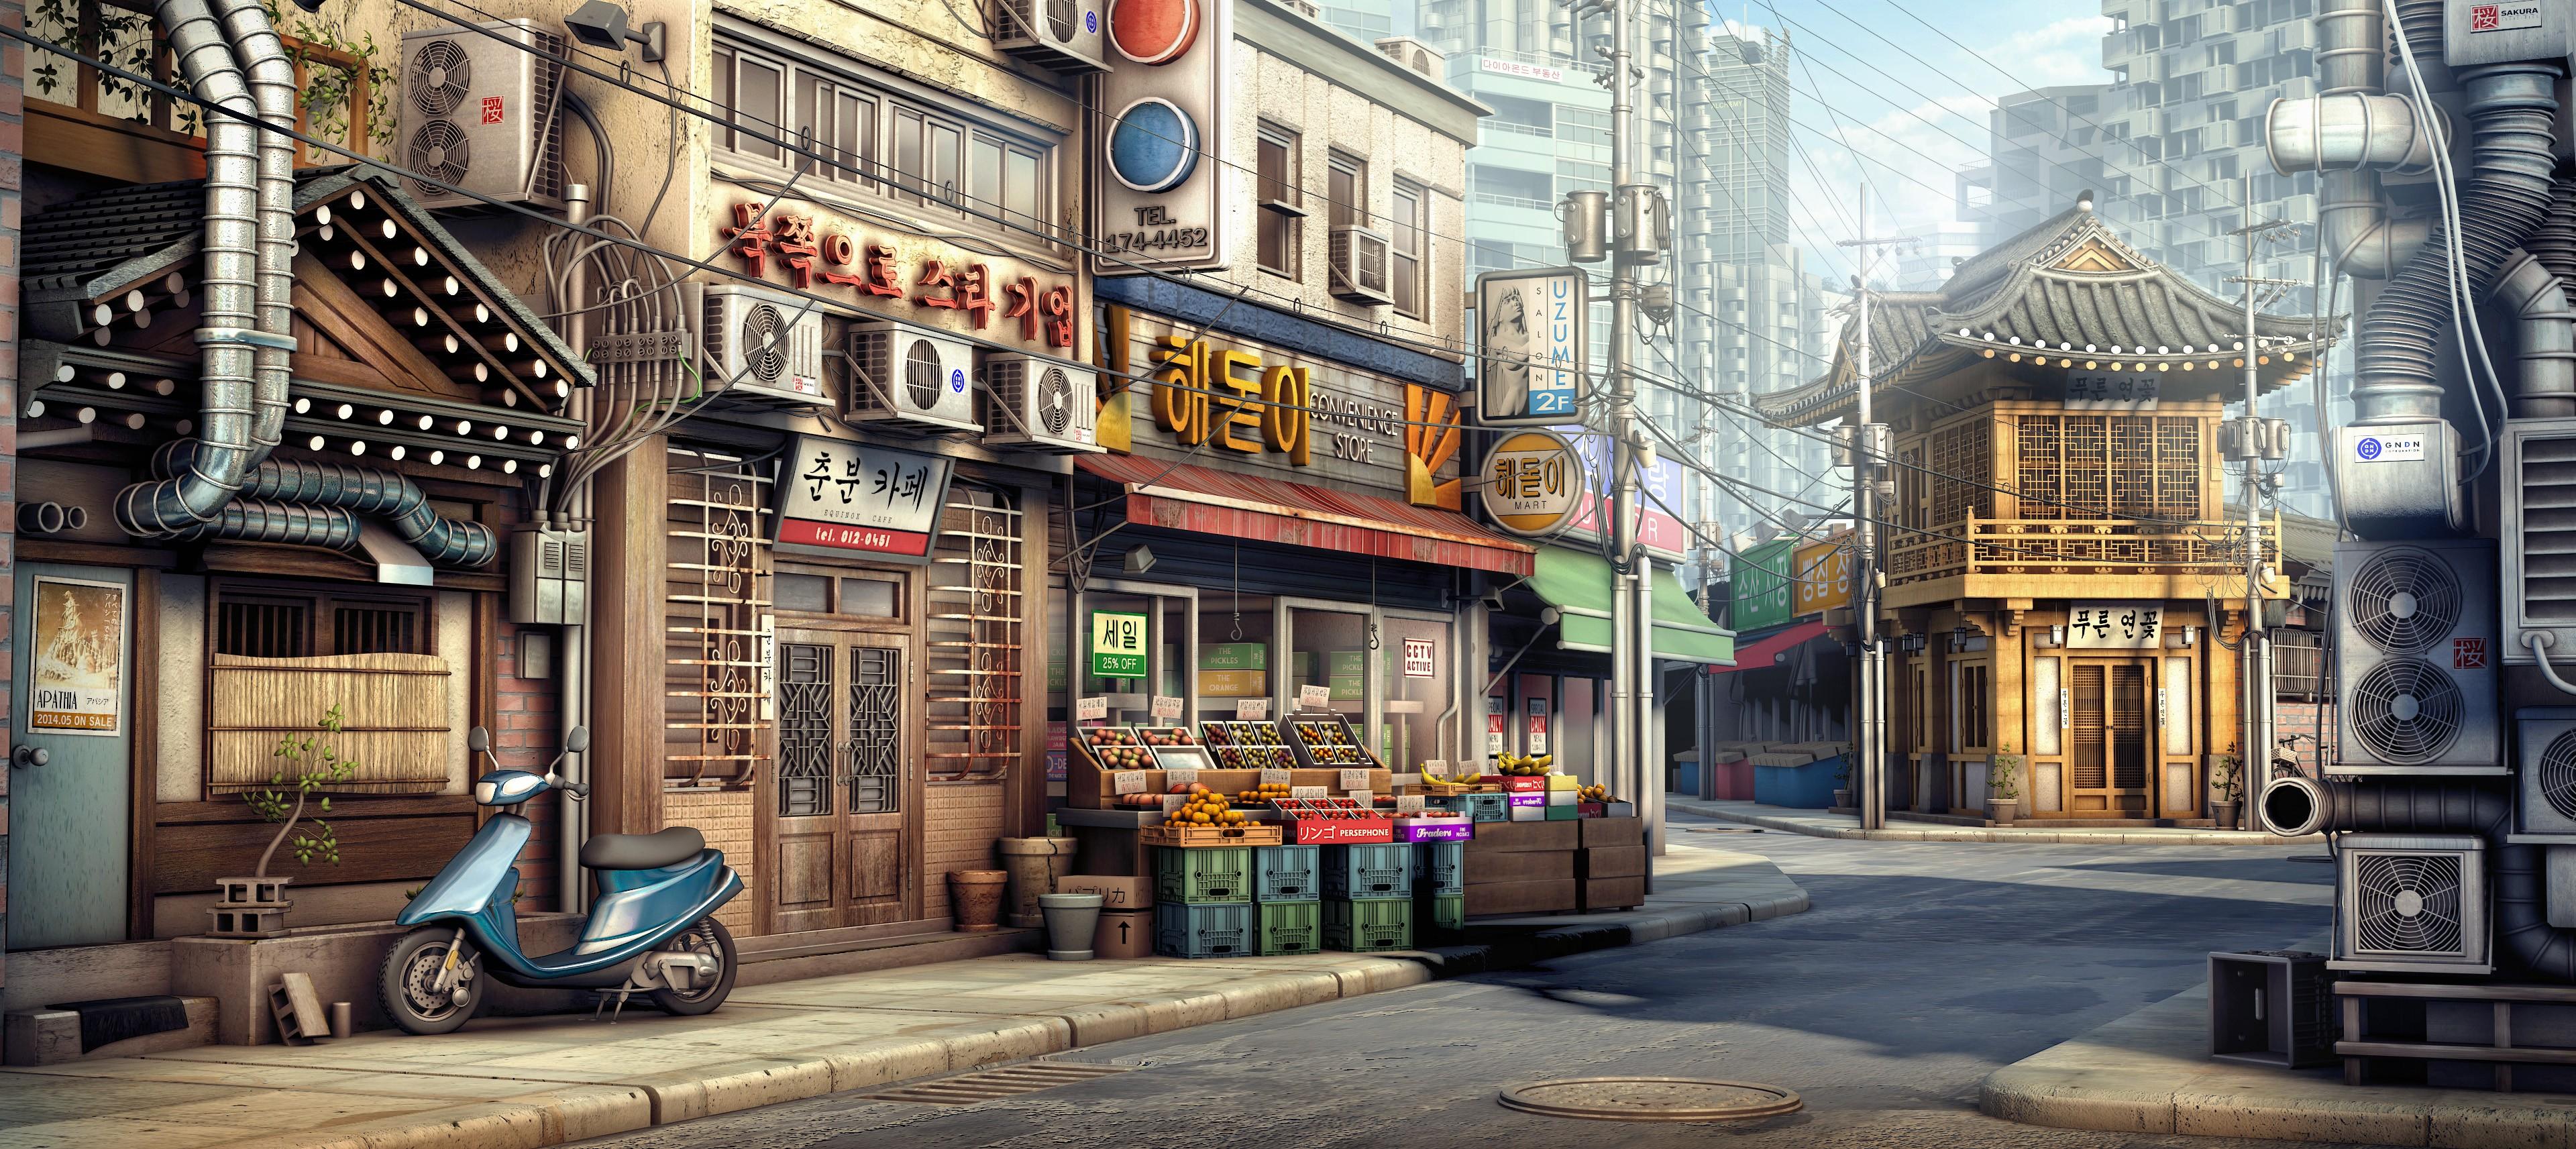 Anime 3840x1713 city Korean anime urban vehicle